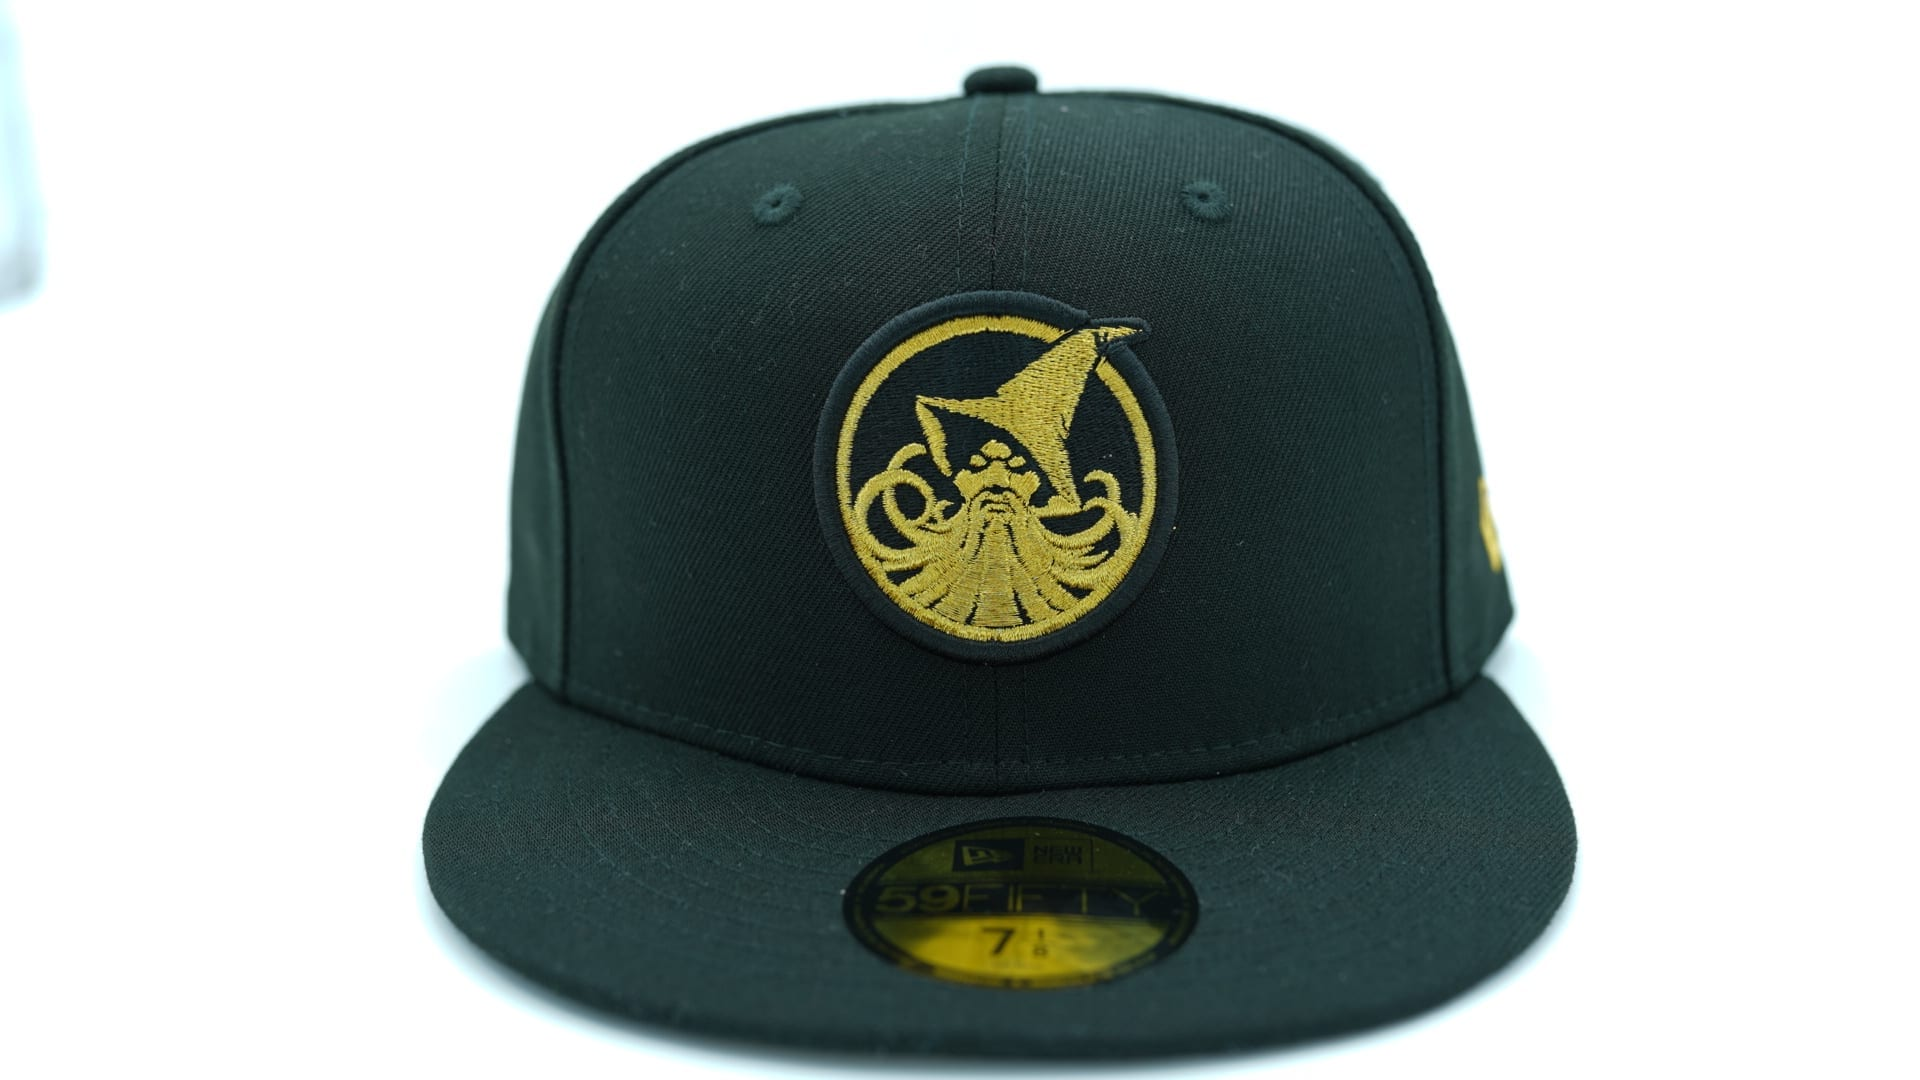 huge discount 85c59 44821 new york knicks retro 59fifty fitted baseball cap new era nba 2